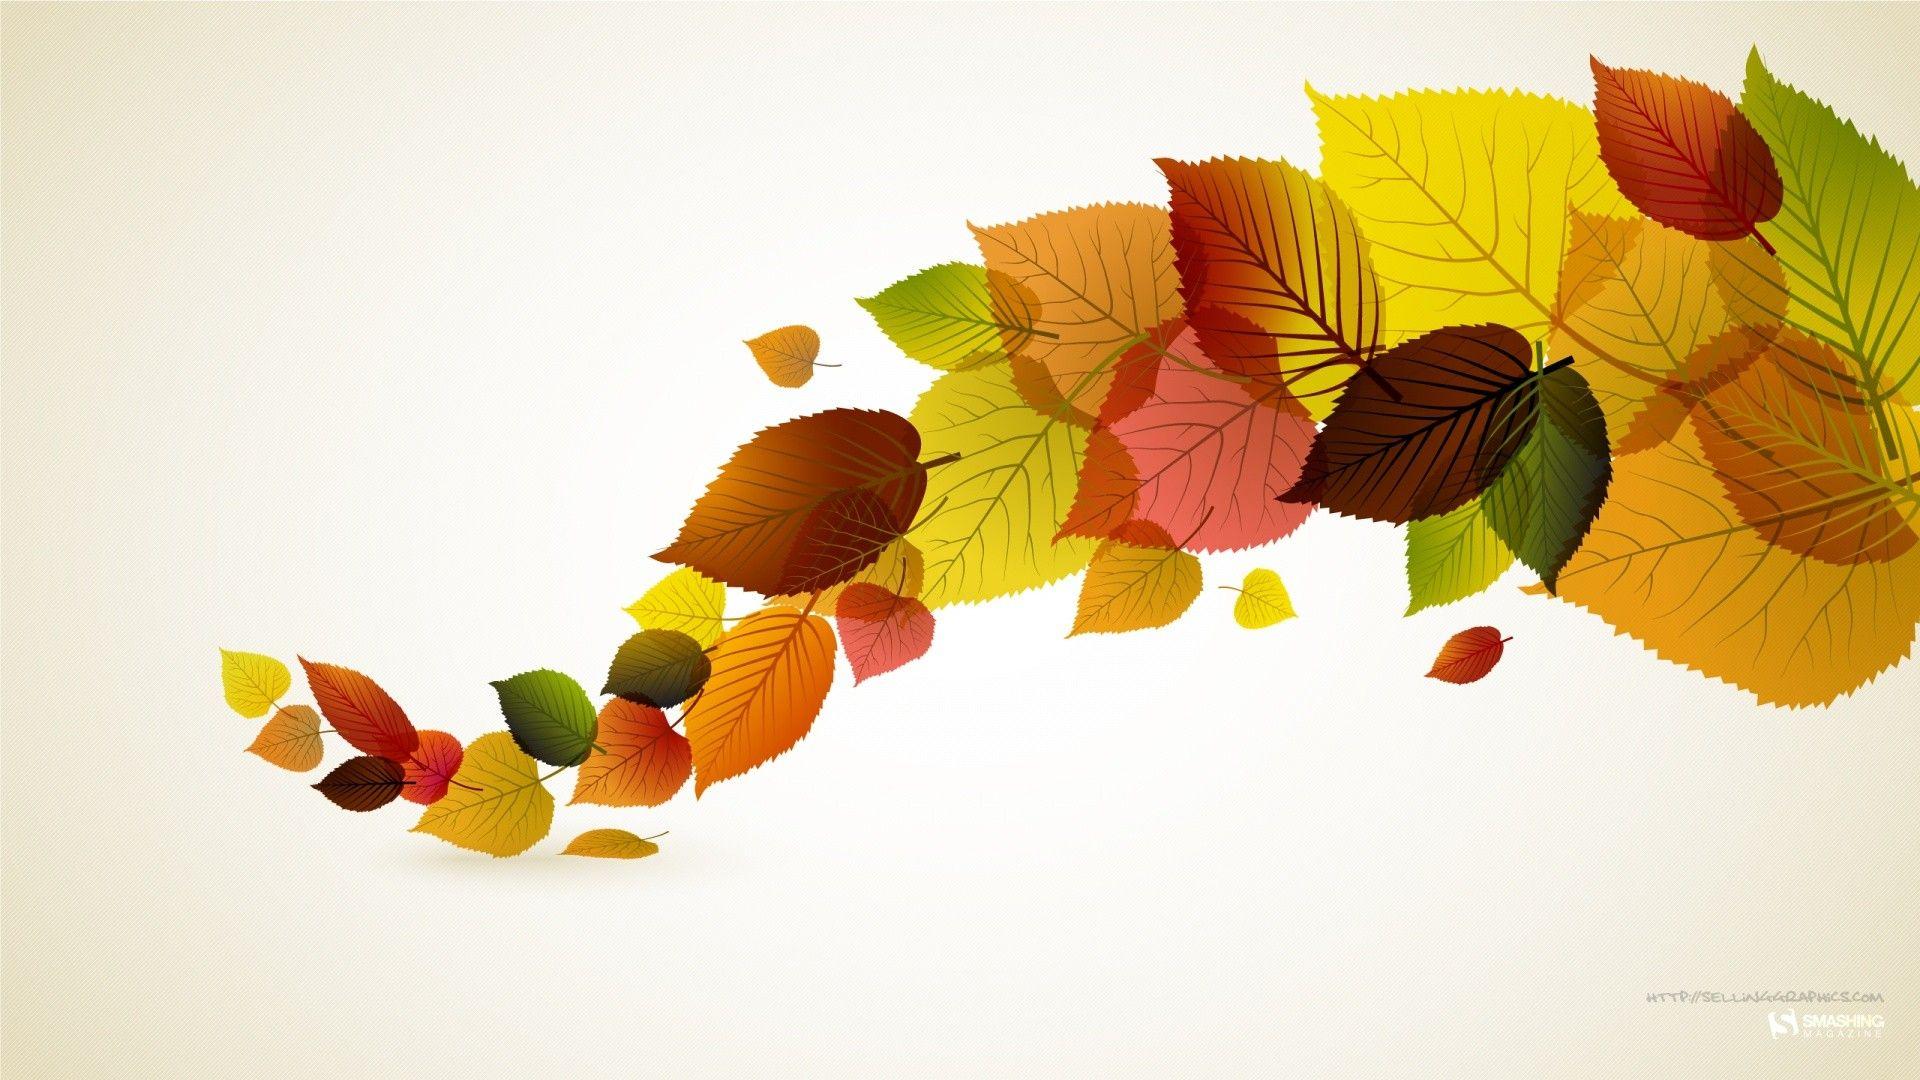 Autumn leaves digital art wallpaper {artist undetermined.